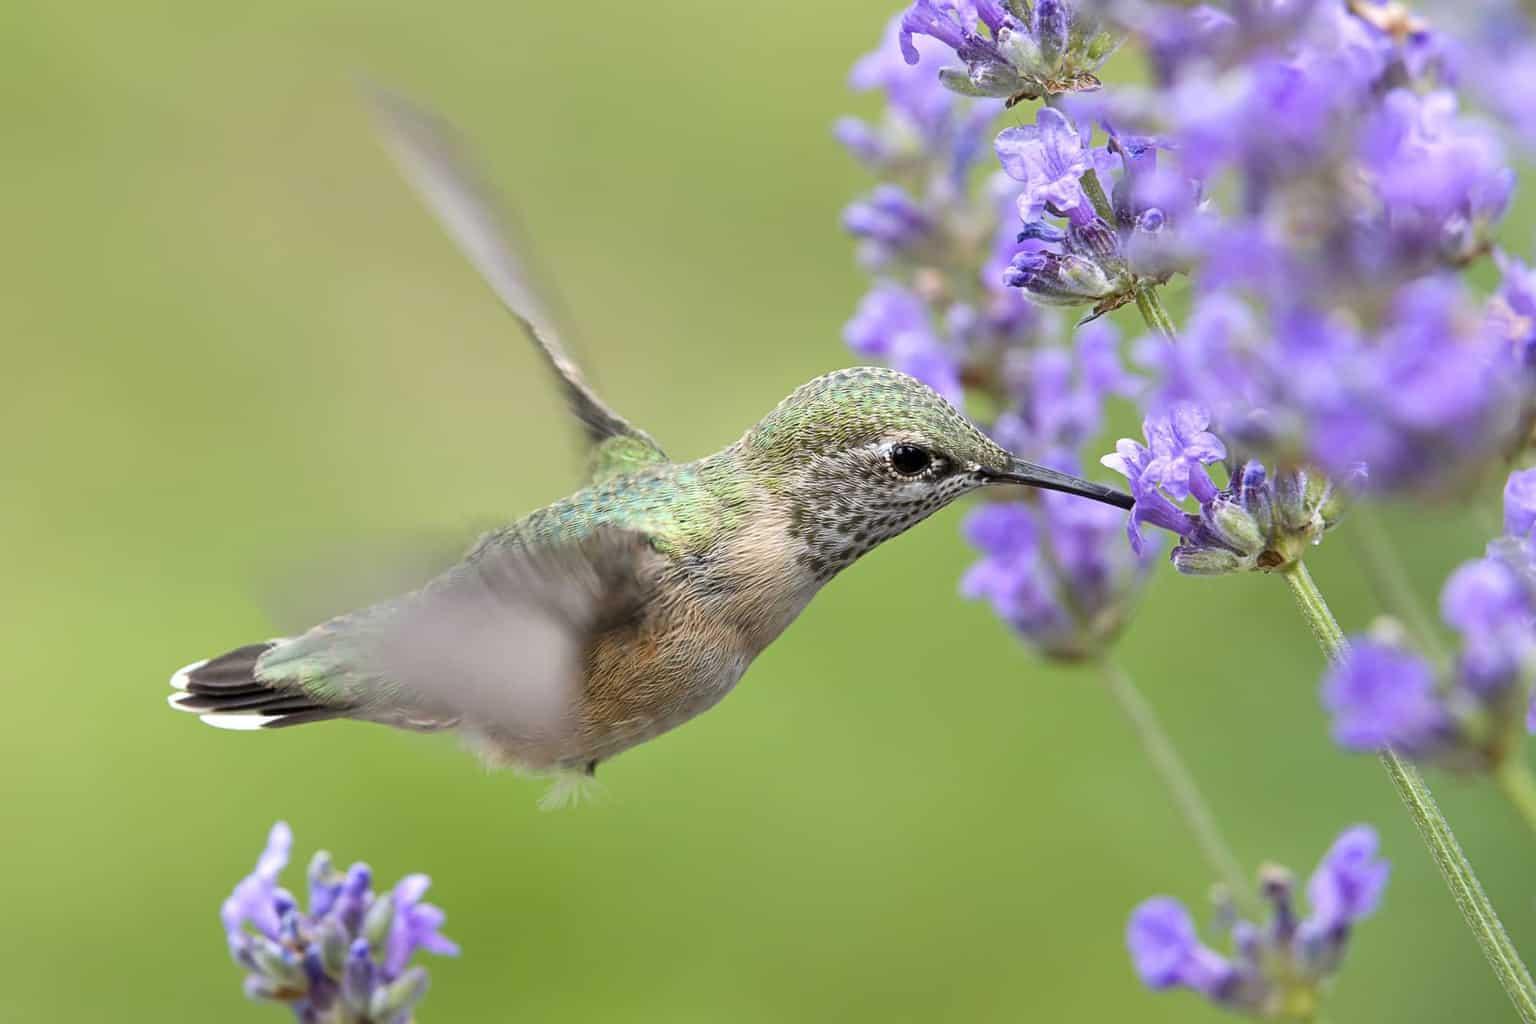 Calliope's Hummingbird